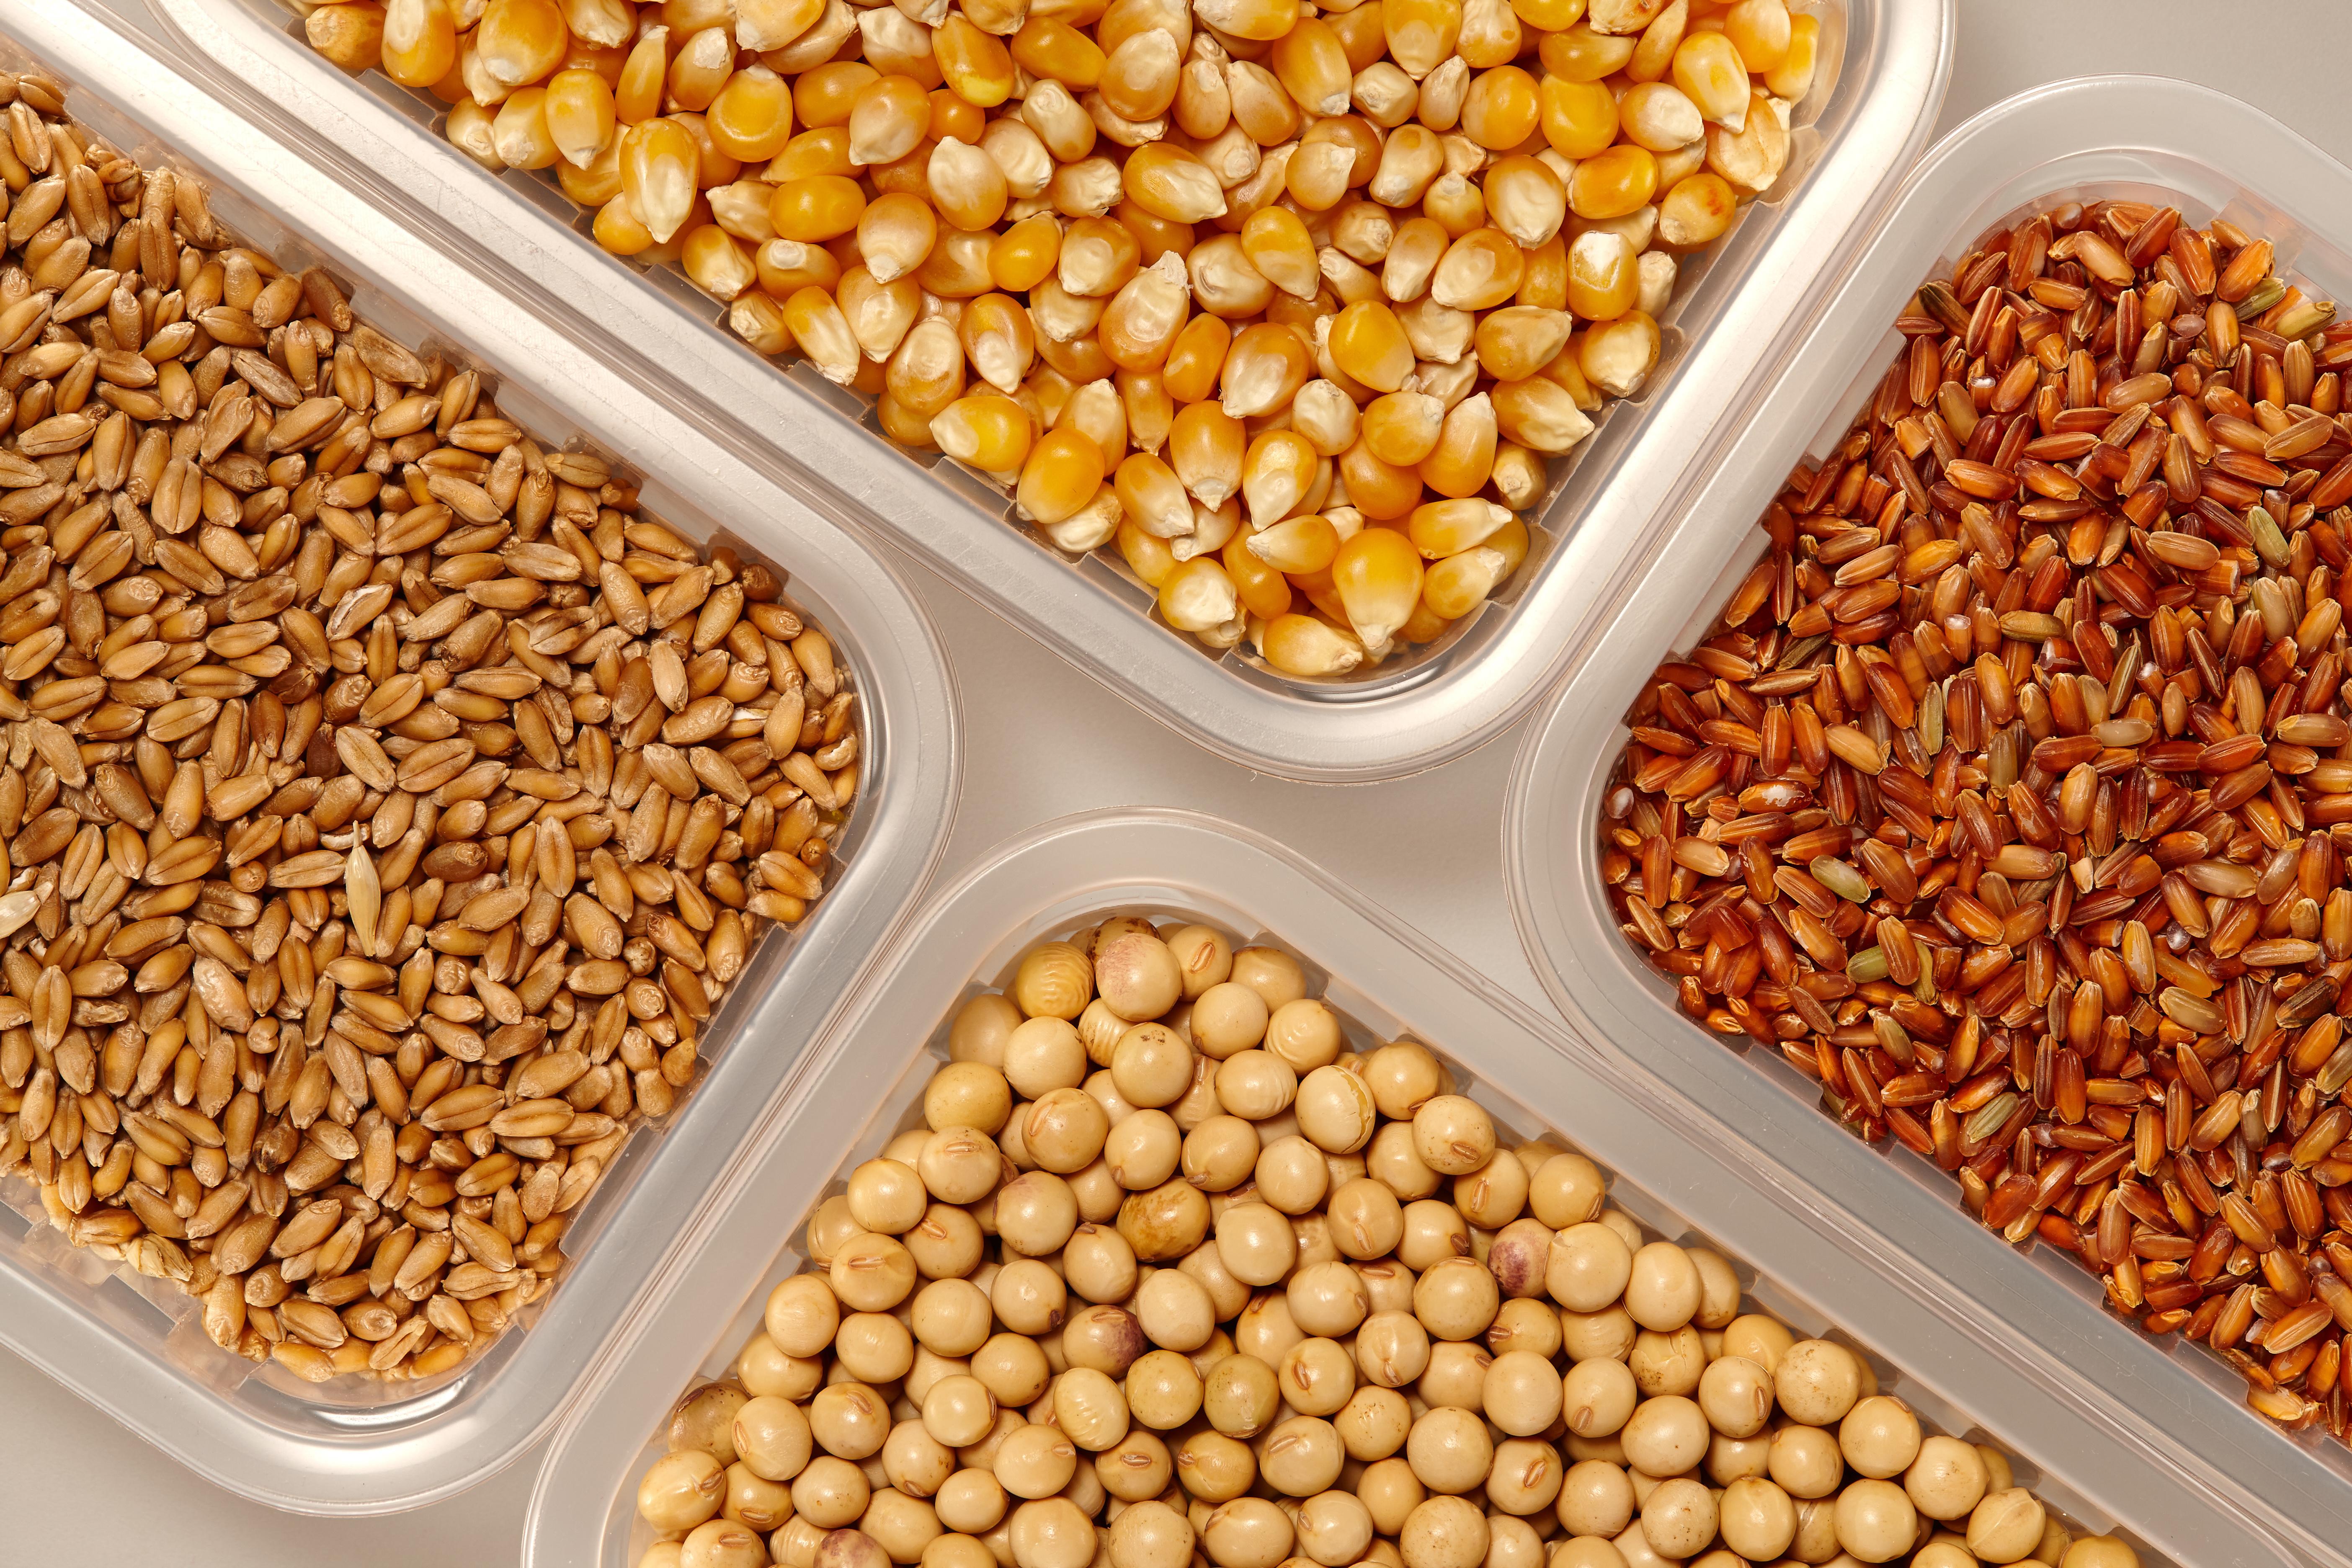 corn-rice-wheat-soybean-AdobeStock_192641392.jpeg